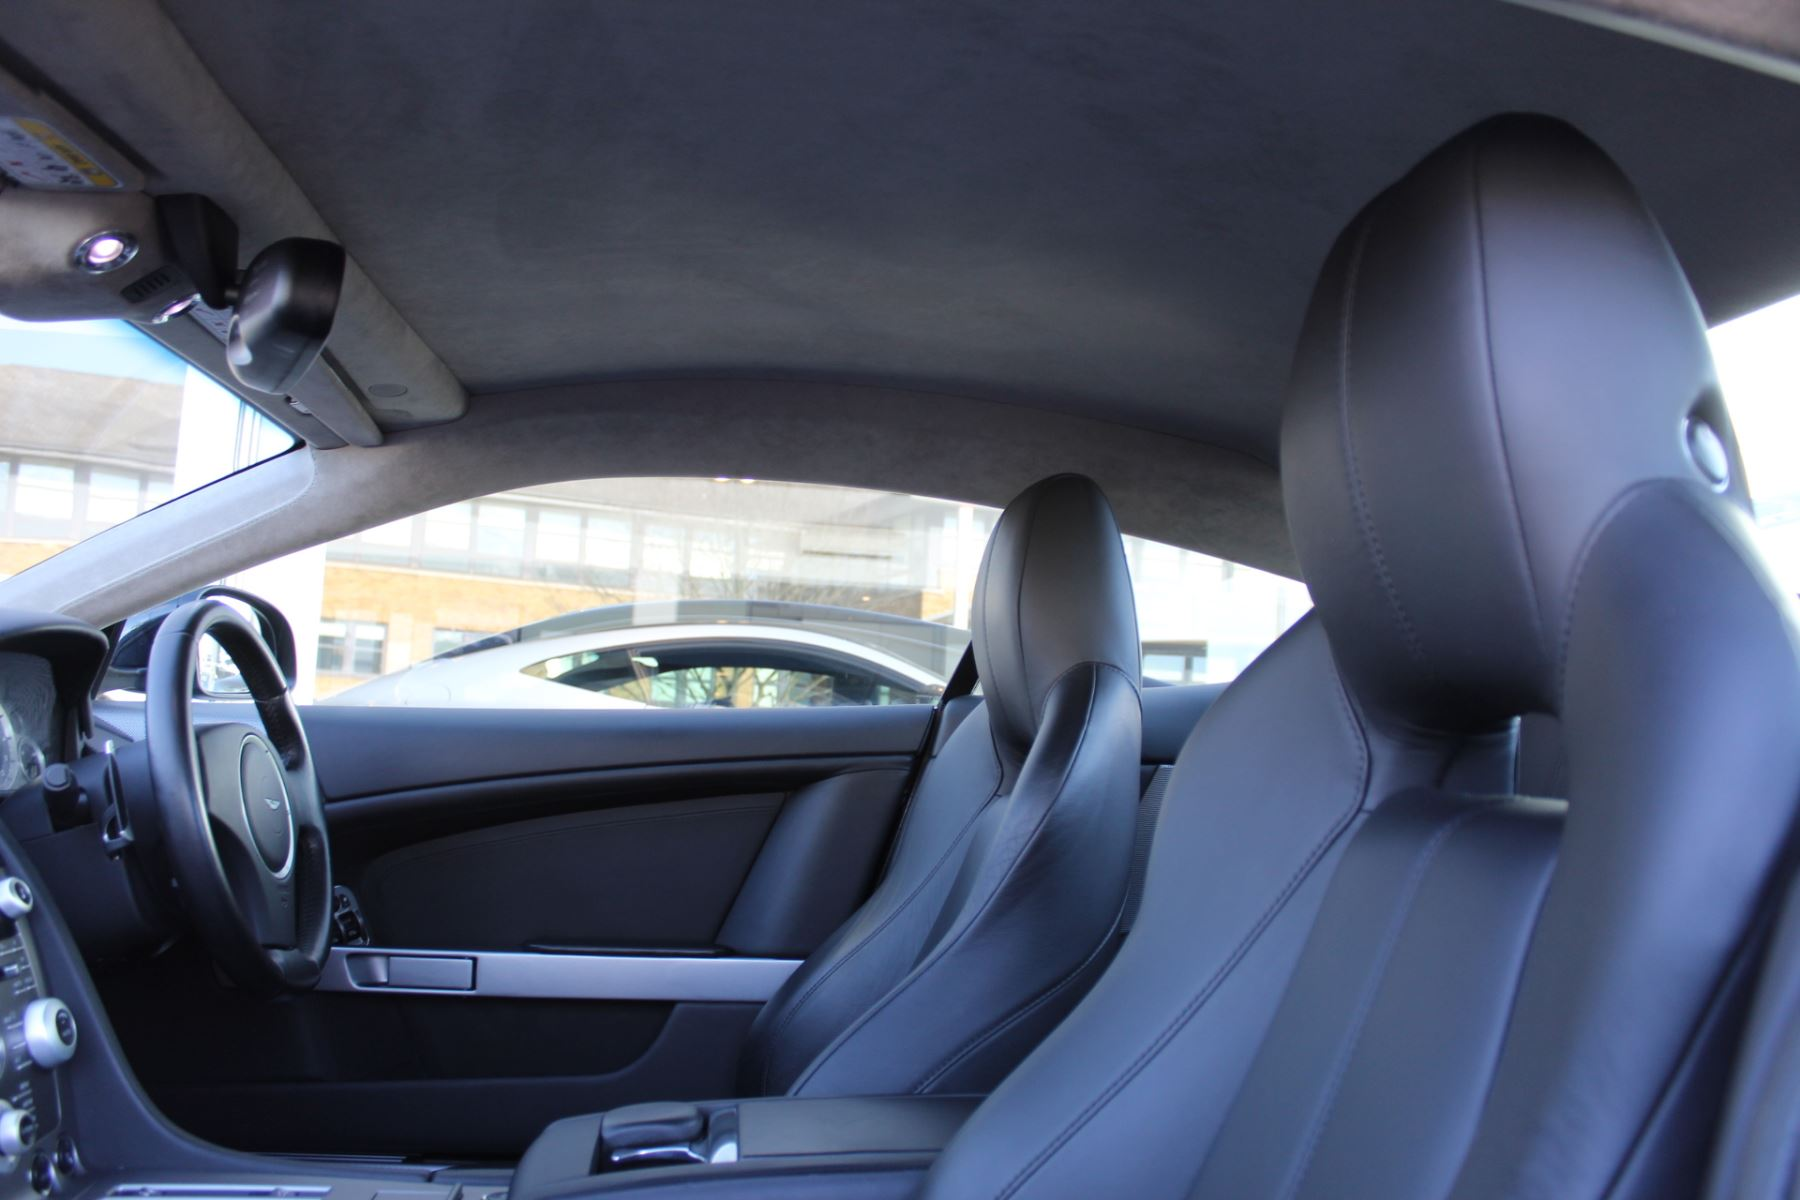 Aston Martin DB9 V12 2dr Touchtronic [470] image 11